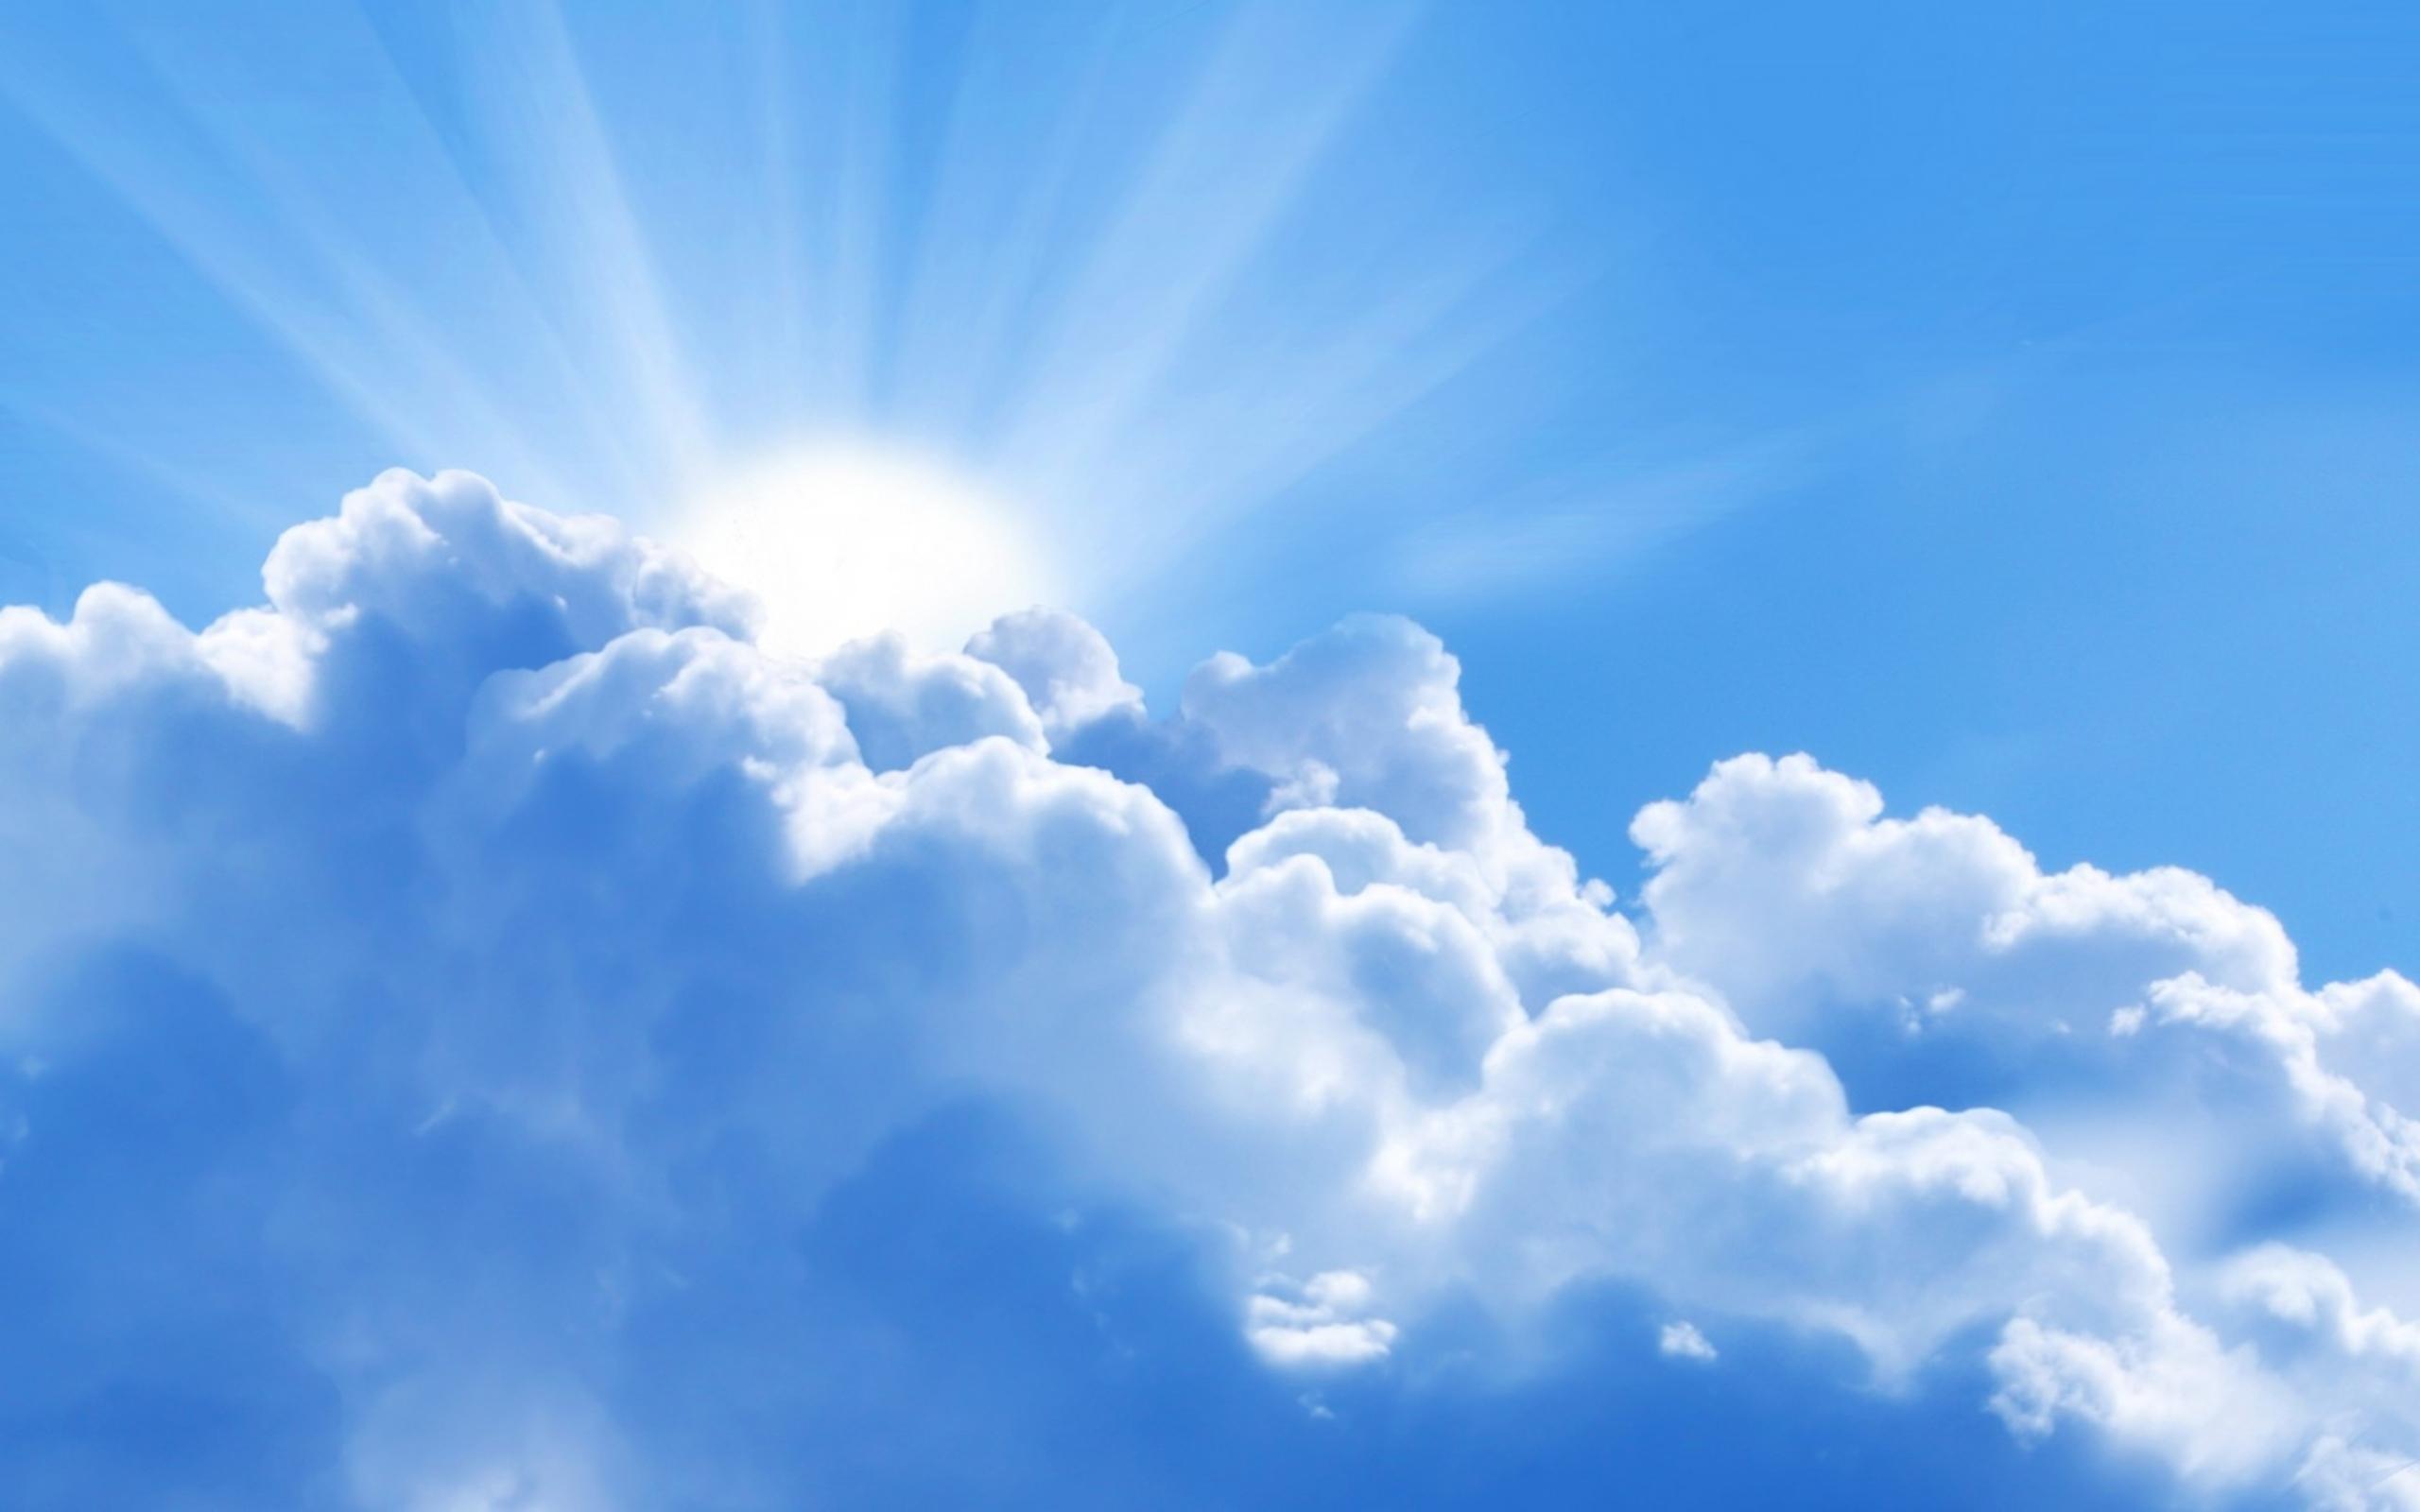 рисунок небо и облака карандашом